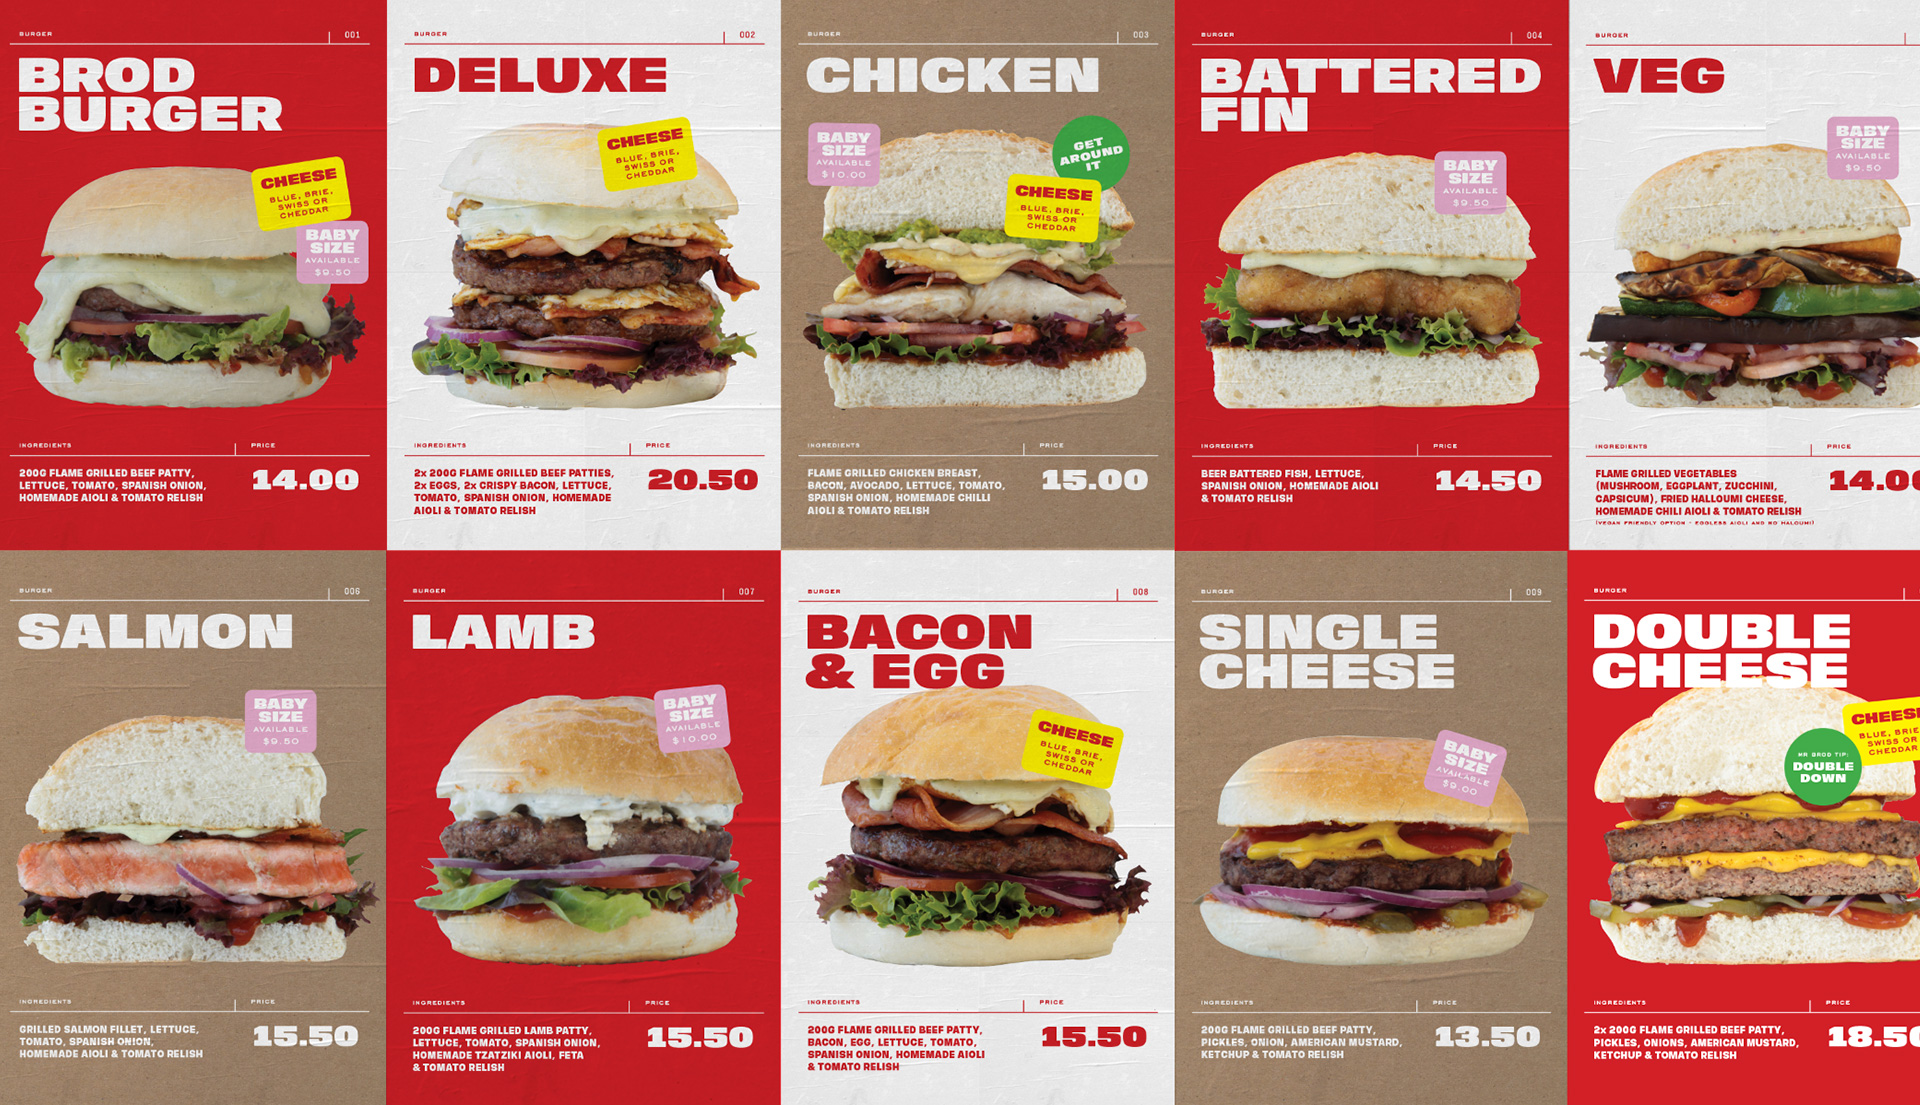 Brodburger fast casual better burger restaurant branding and rebranding by Inkblot in Canberra Australia